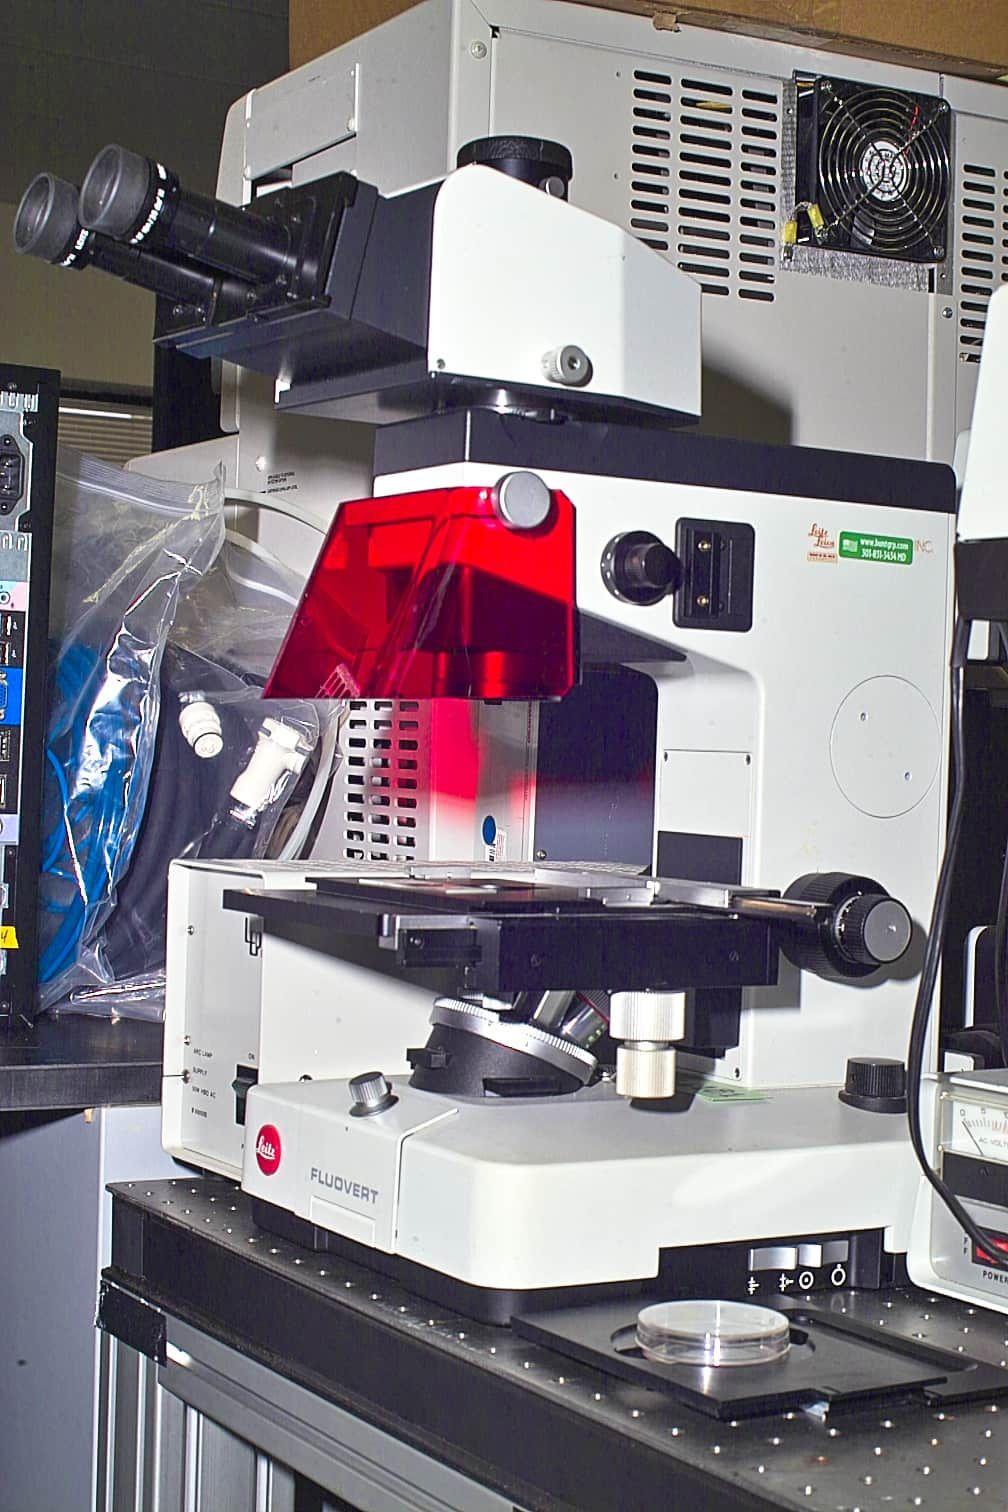 E. LEITZ FLUOVERT INVERTED BIOLOGICAL MICROSCOPE FOR FLUORESCENCE AND PHASE STUDIES